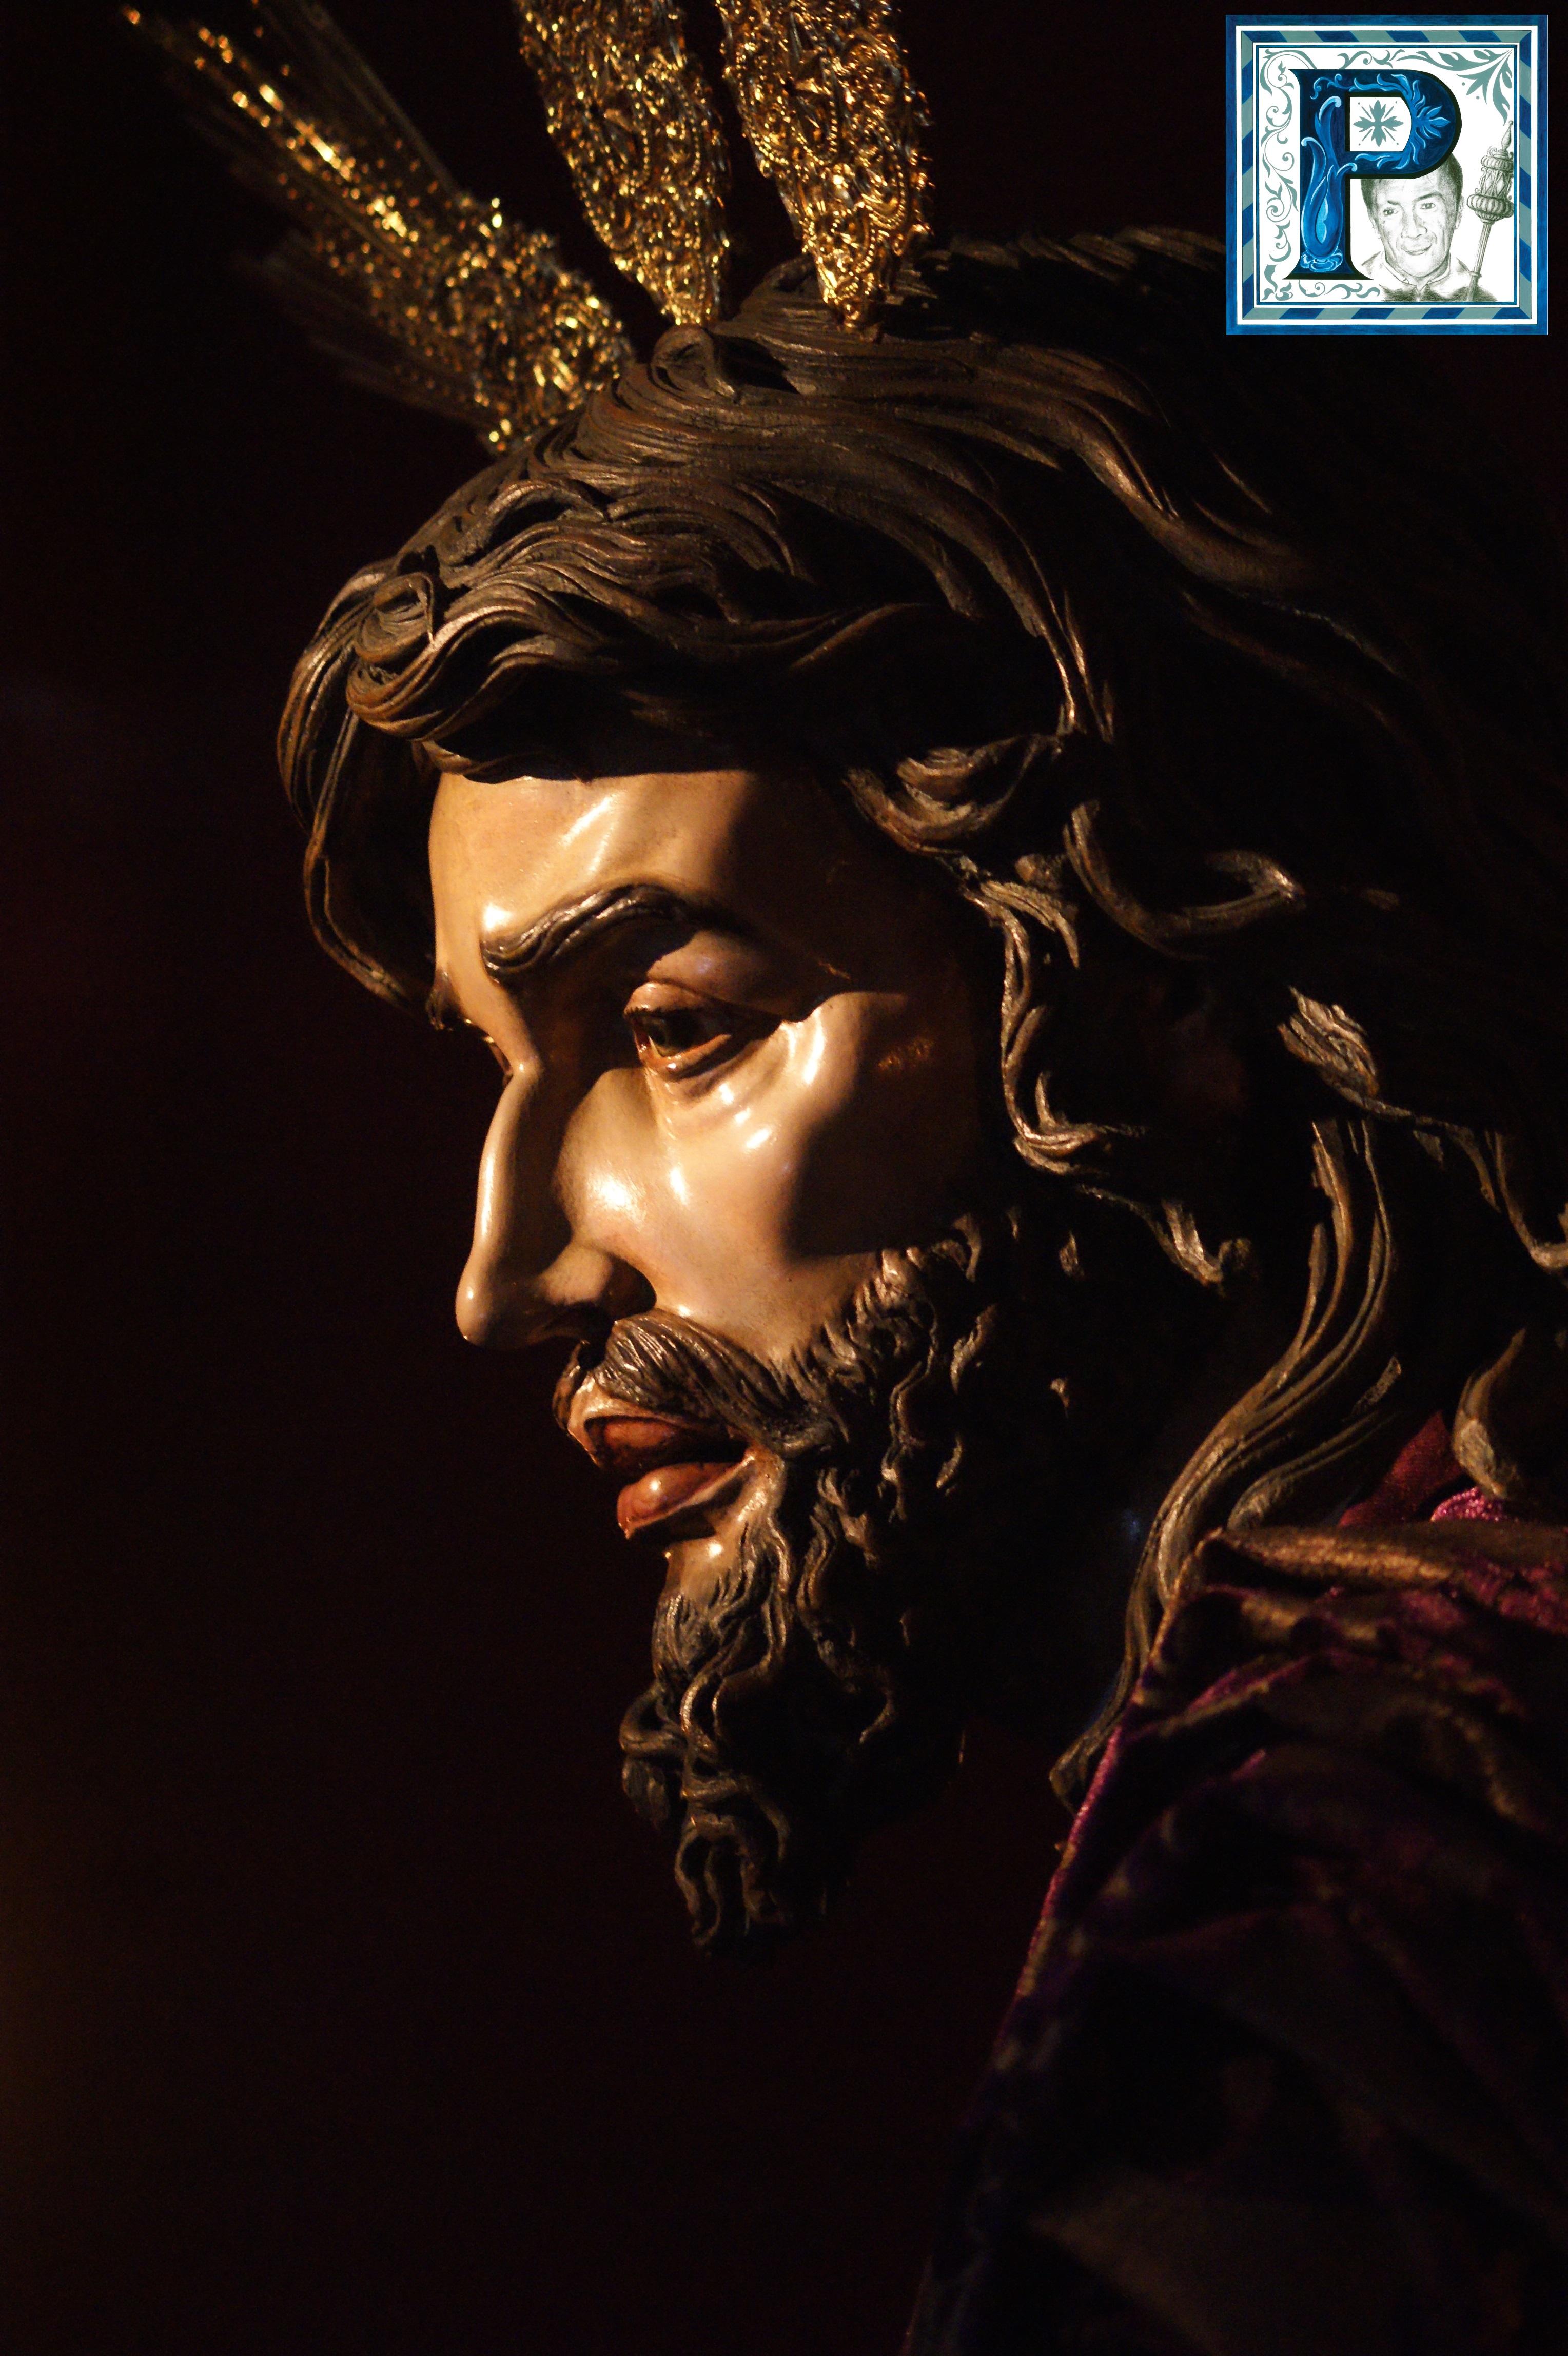 La Agrupación Musical Santísimo Cristo de la Clemencia se presenta hoy de manera oficial en la Parroquia de San Benito